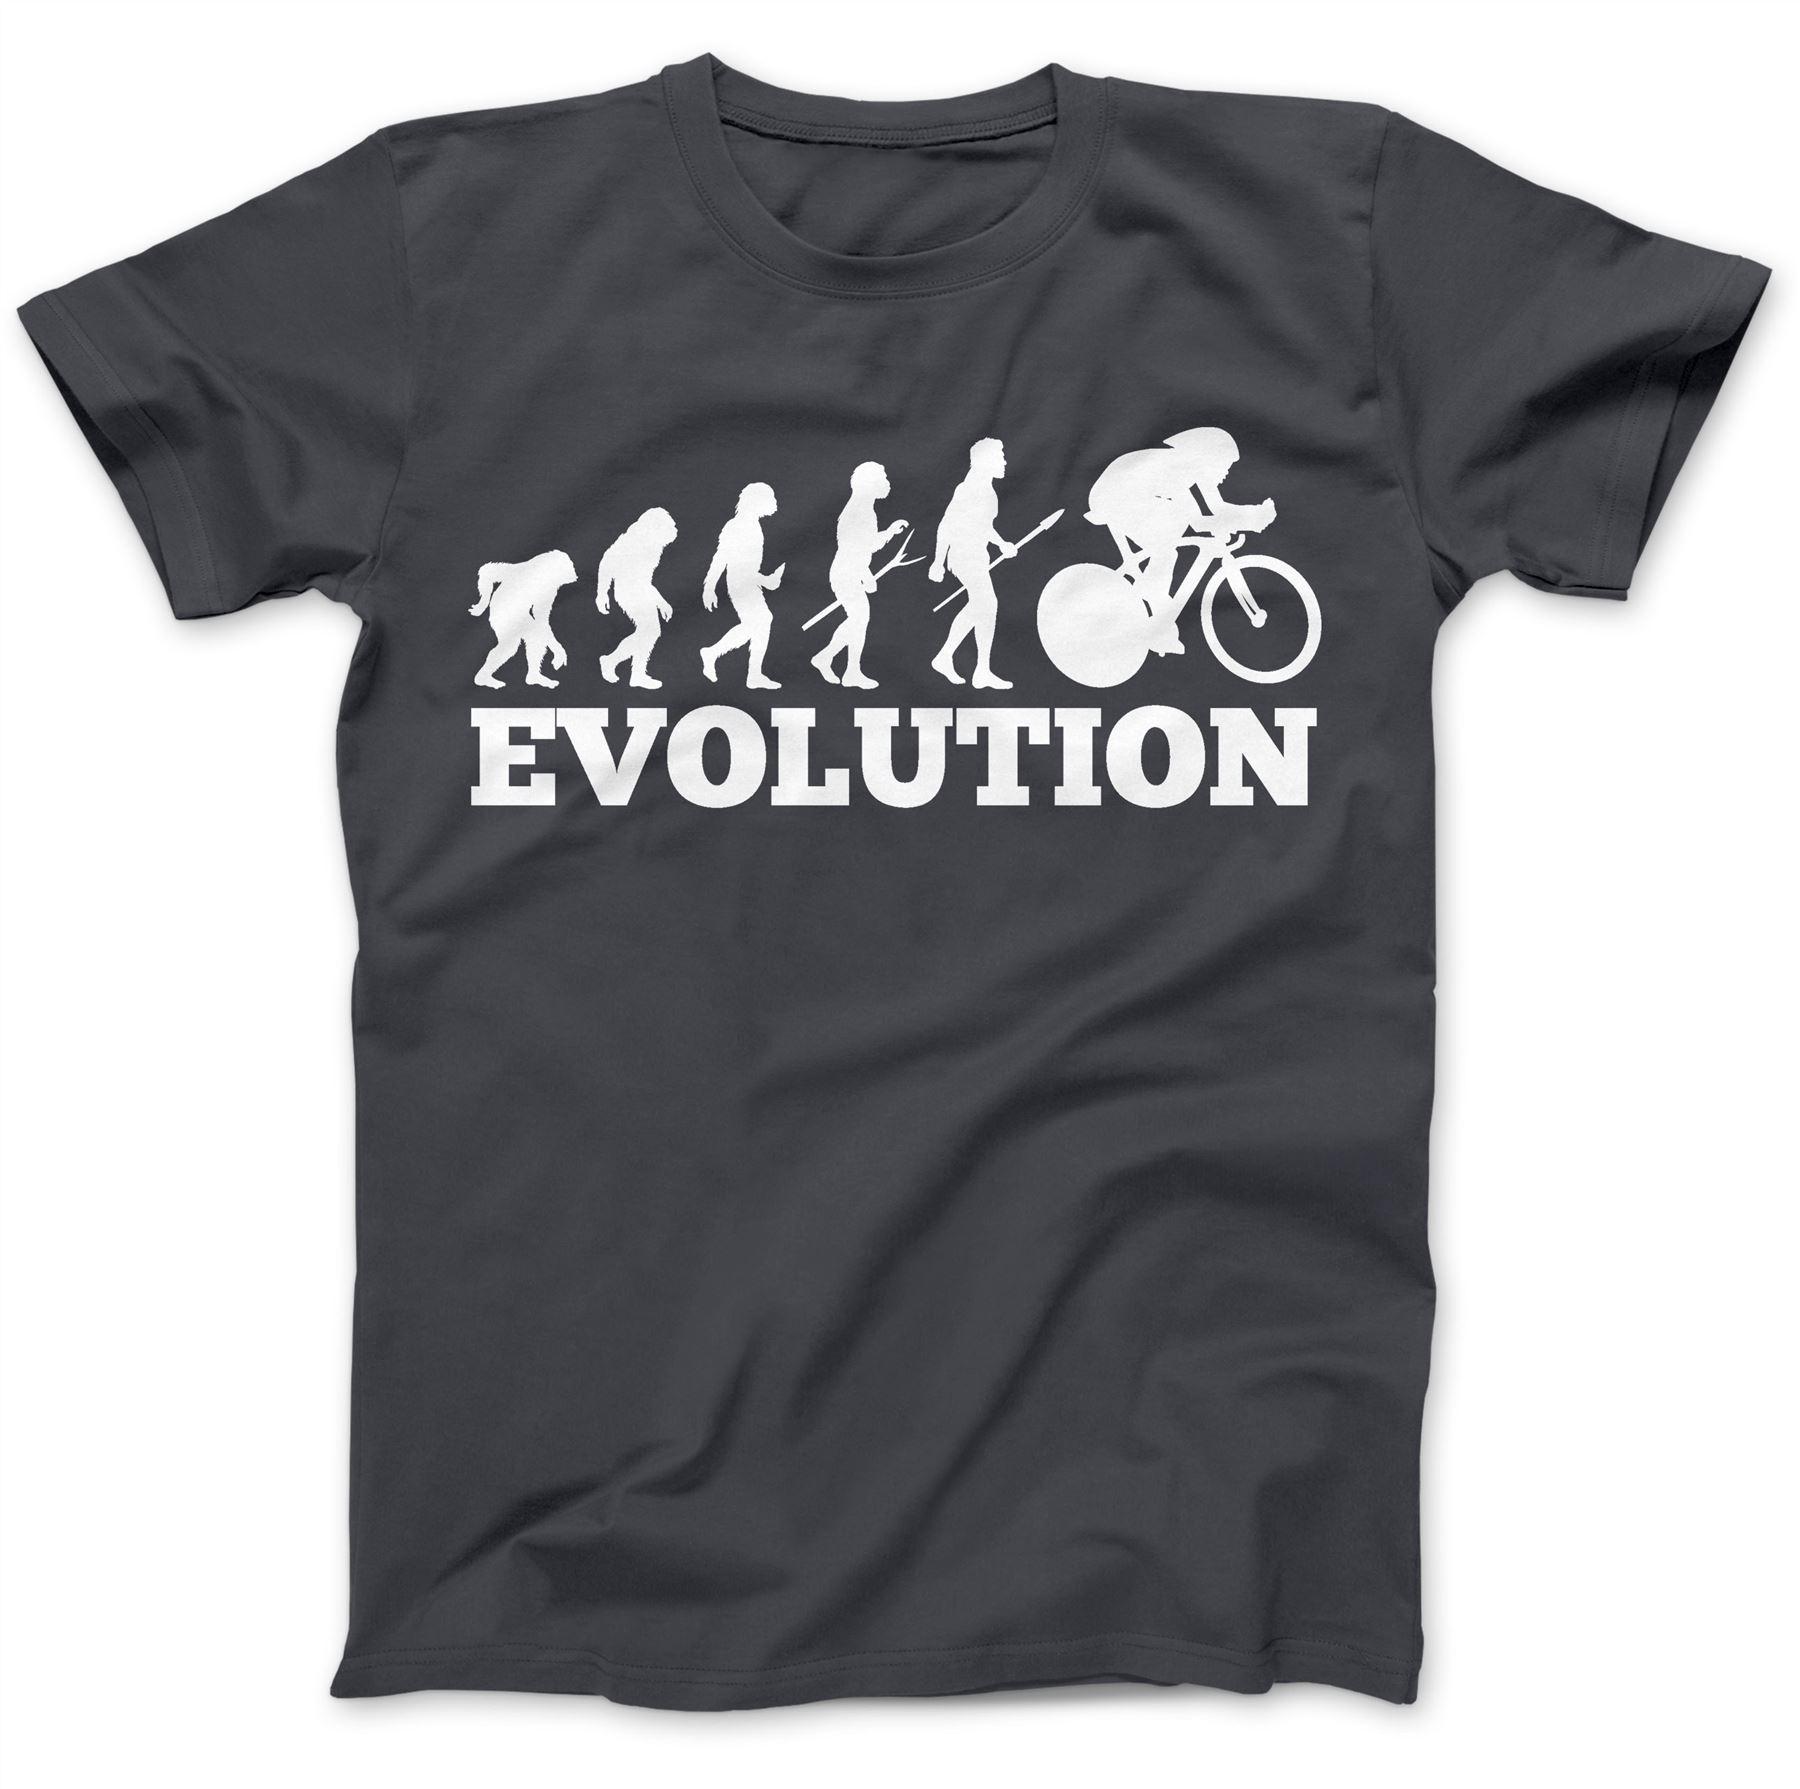 Eat Sleep Bike Repeat T-shirt Tshirt Tee Biker Cyclist Cycling Gift Birthday